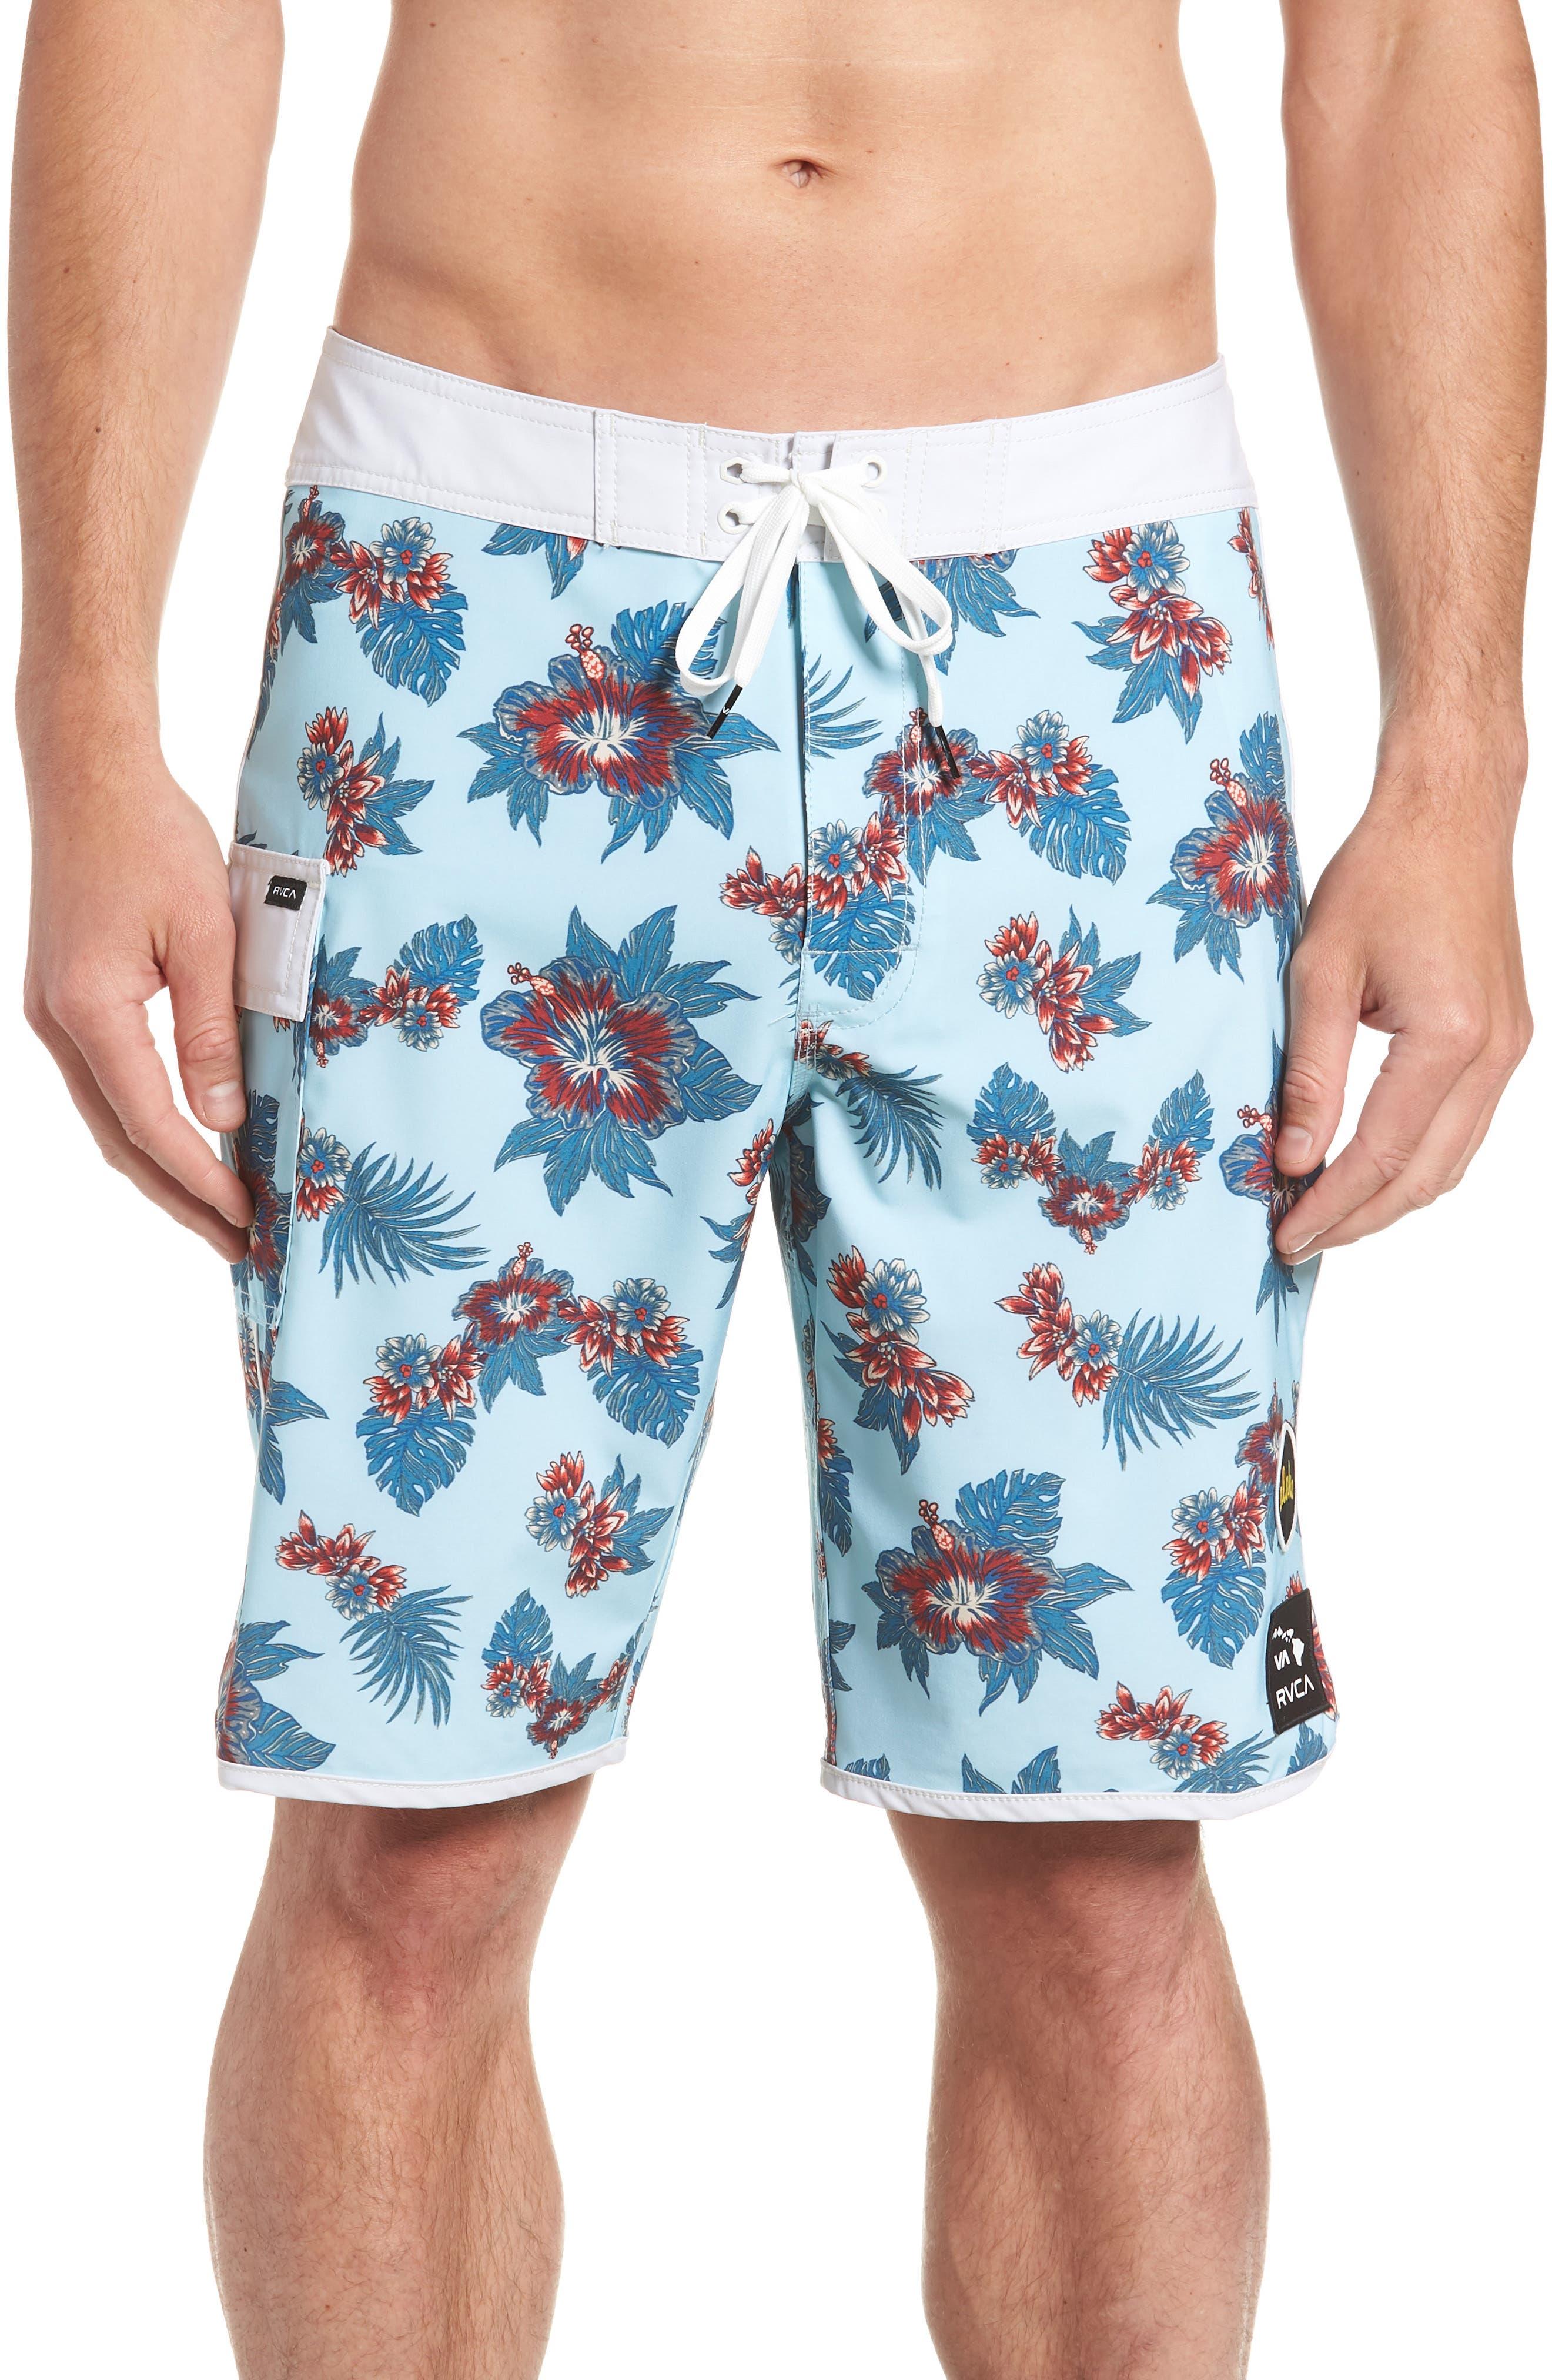 Jeff McMillan Floral Swim Trunks,                             Main thumbnail 1, color,                             Blue Floral